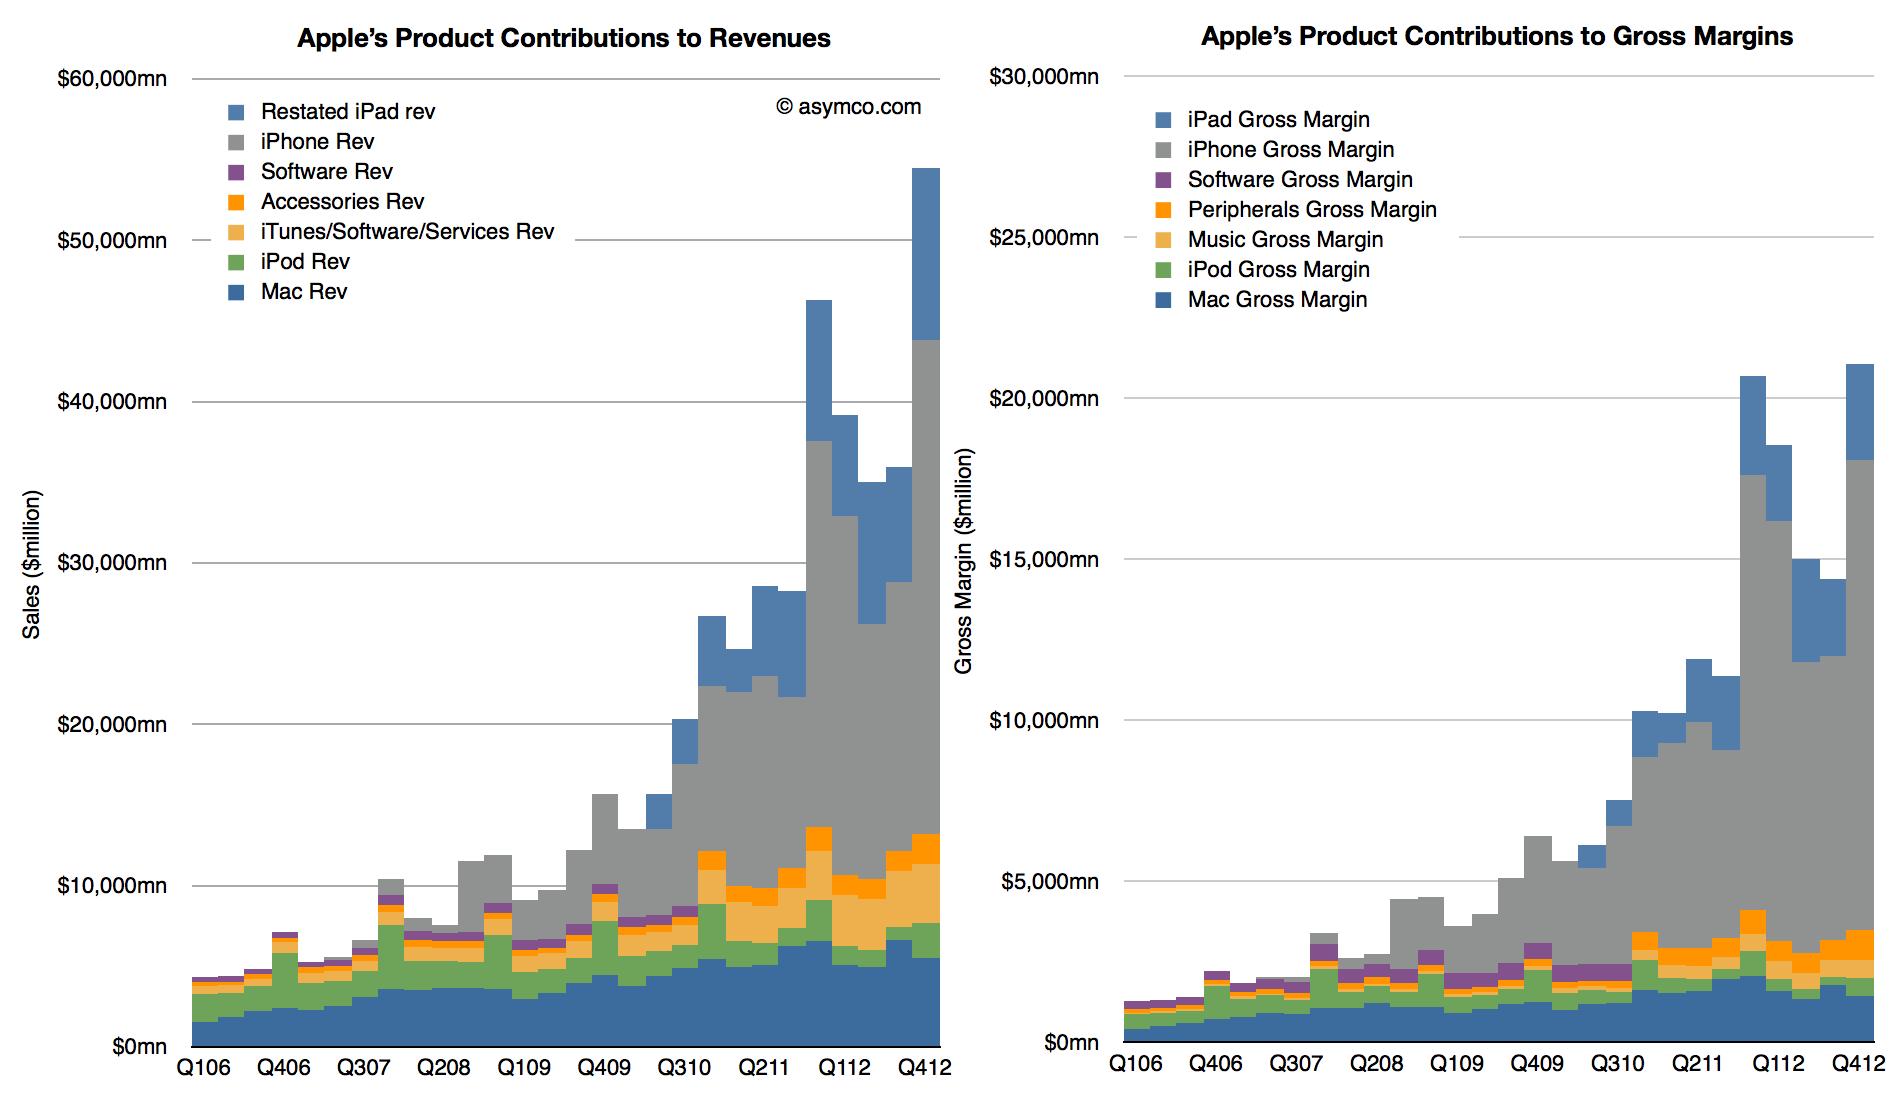 ganacias e ingresos de apple x productos